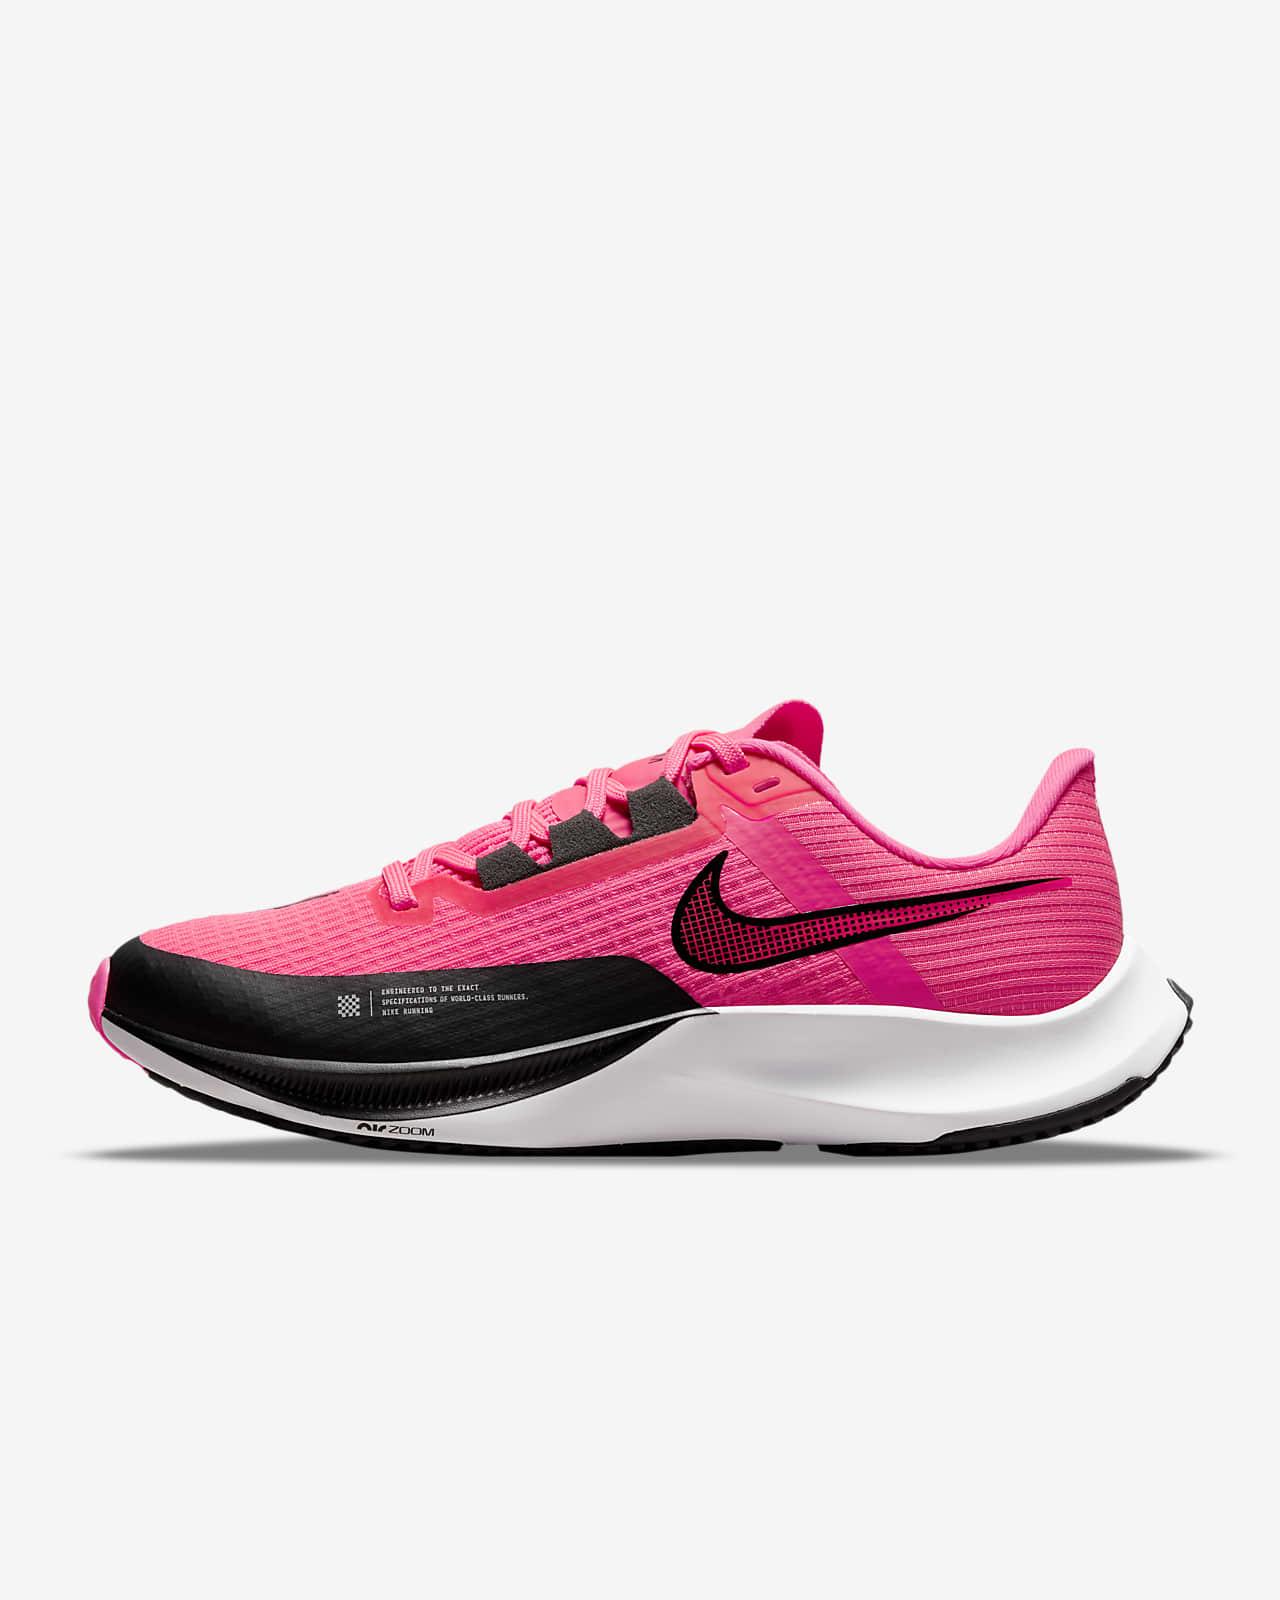 Calzado de carrera para mujer Nike Air Zoom Rival Fly 3